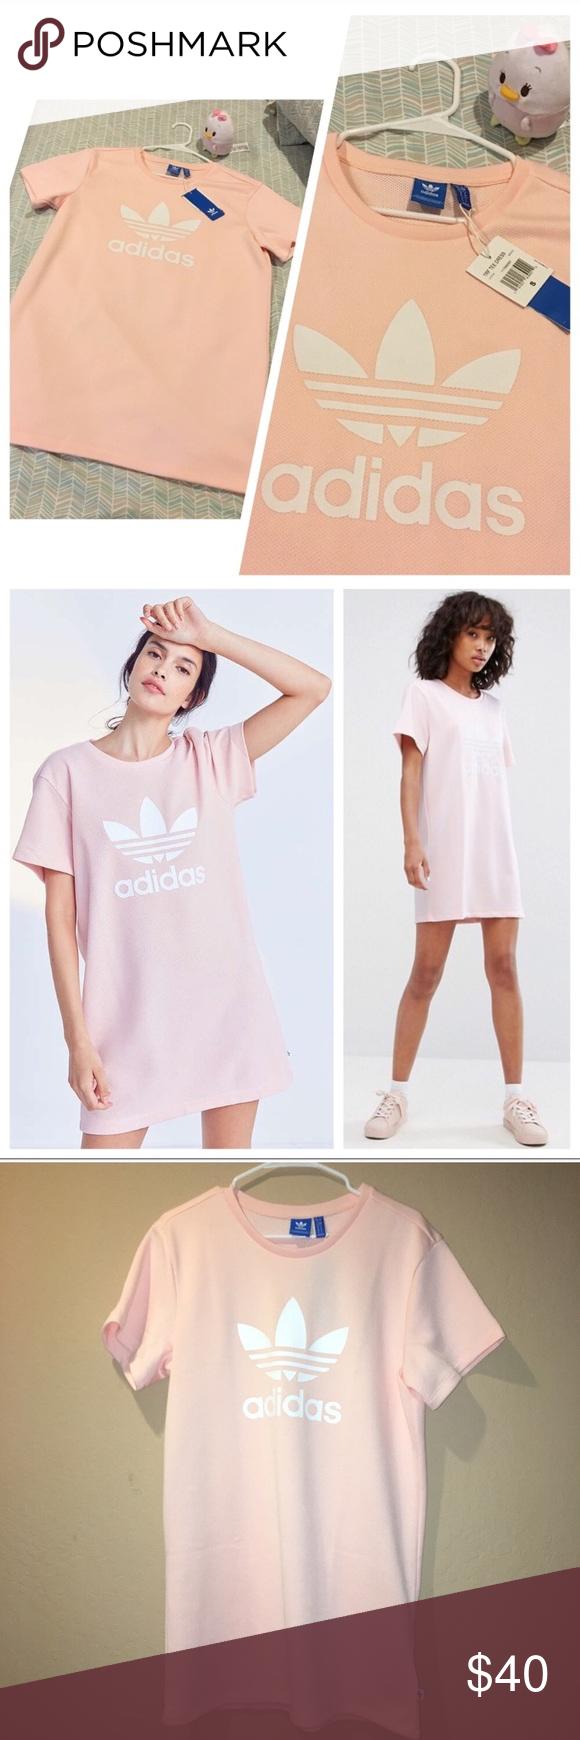 Adidas Pink Trefoil Tee Dress   Adidas sporty   chic Trefoil t-shirt dress  in d3a5b12a3